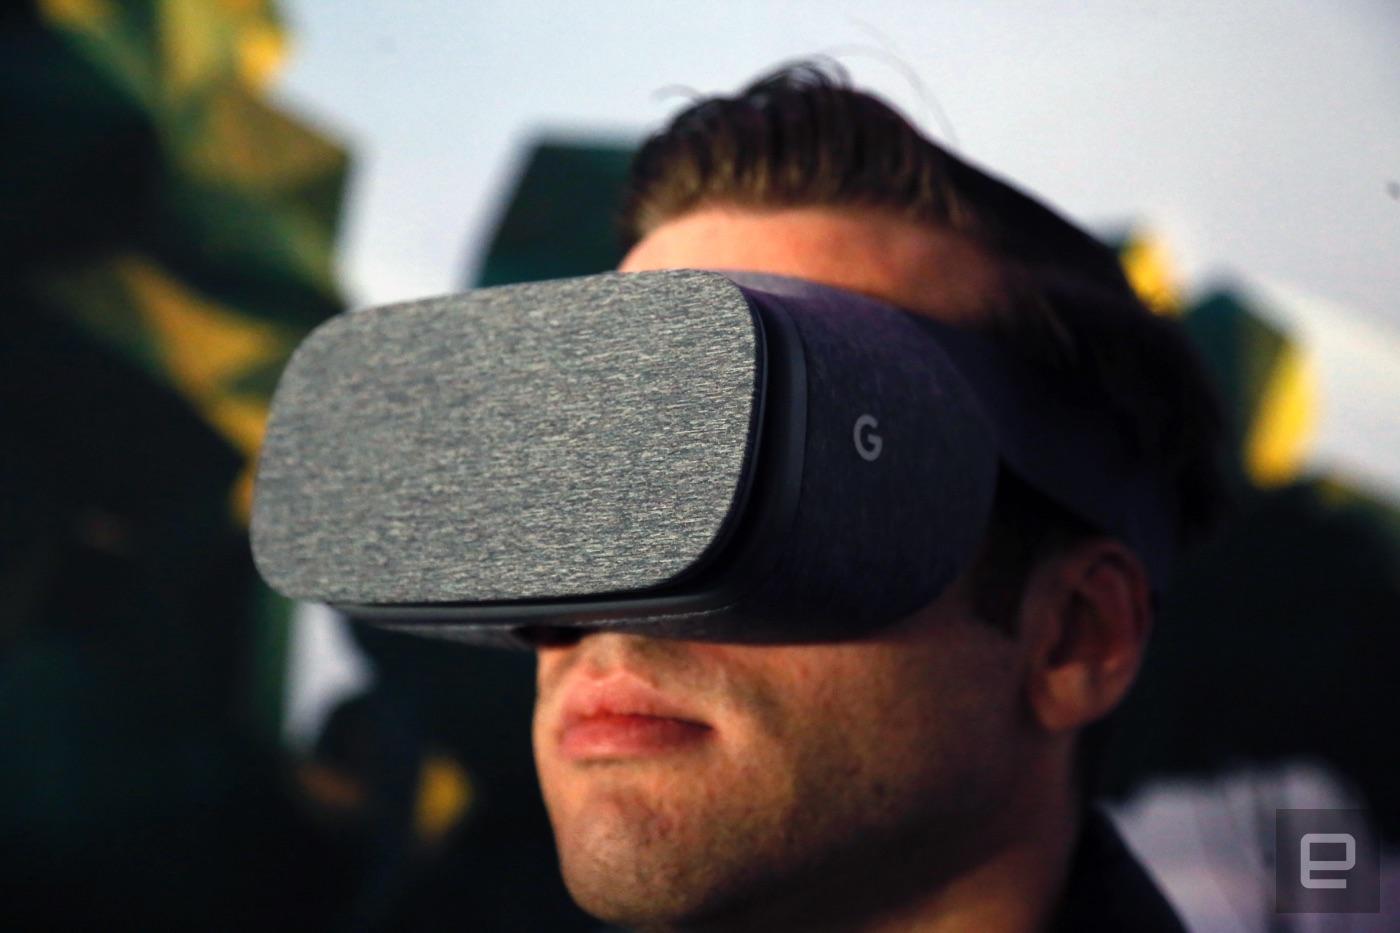 Google 的 Daydream View 是一般大众向的 VR 头戴设备